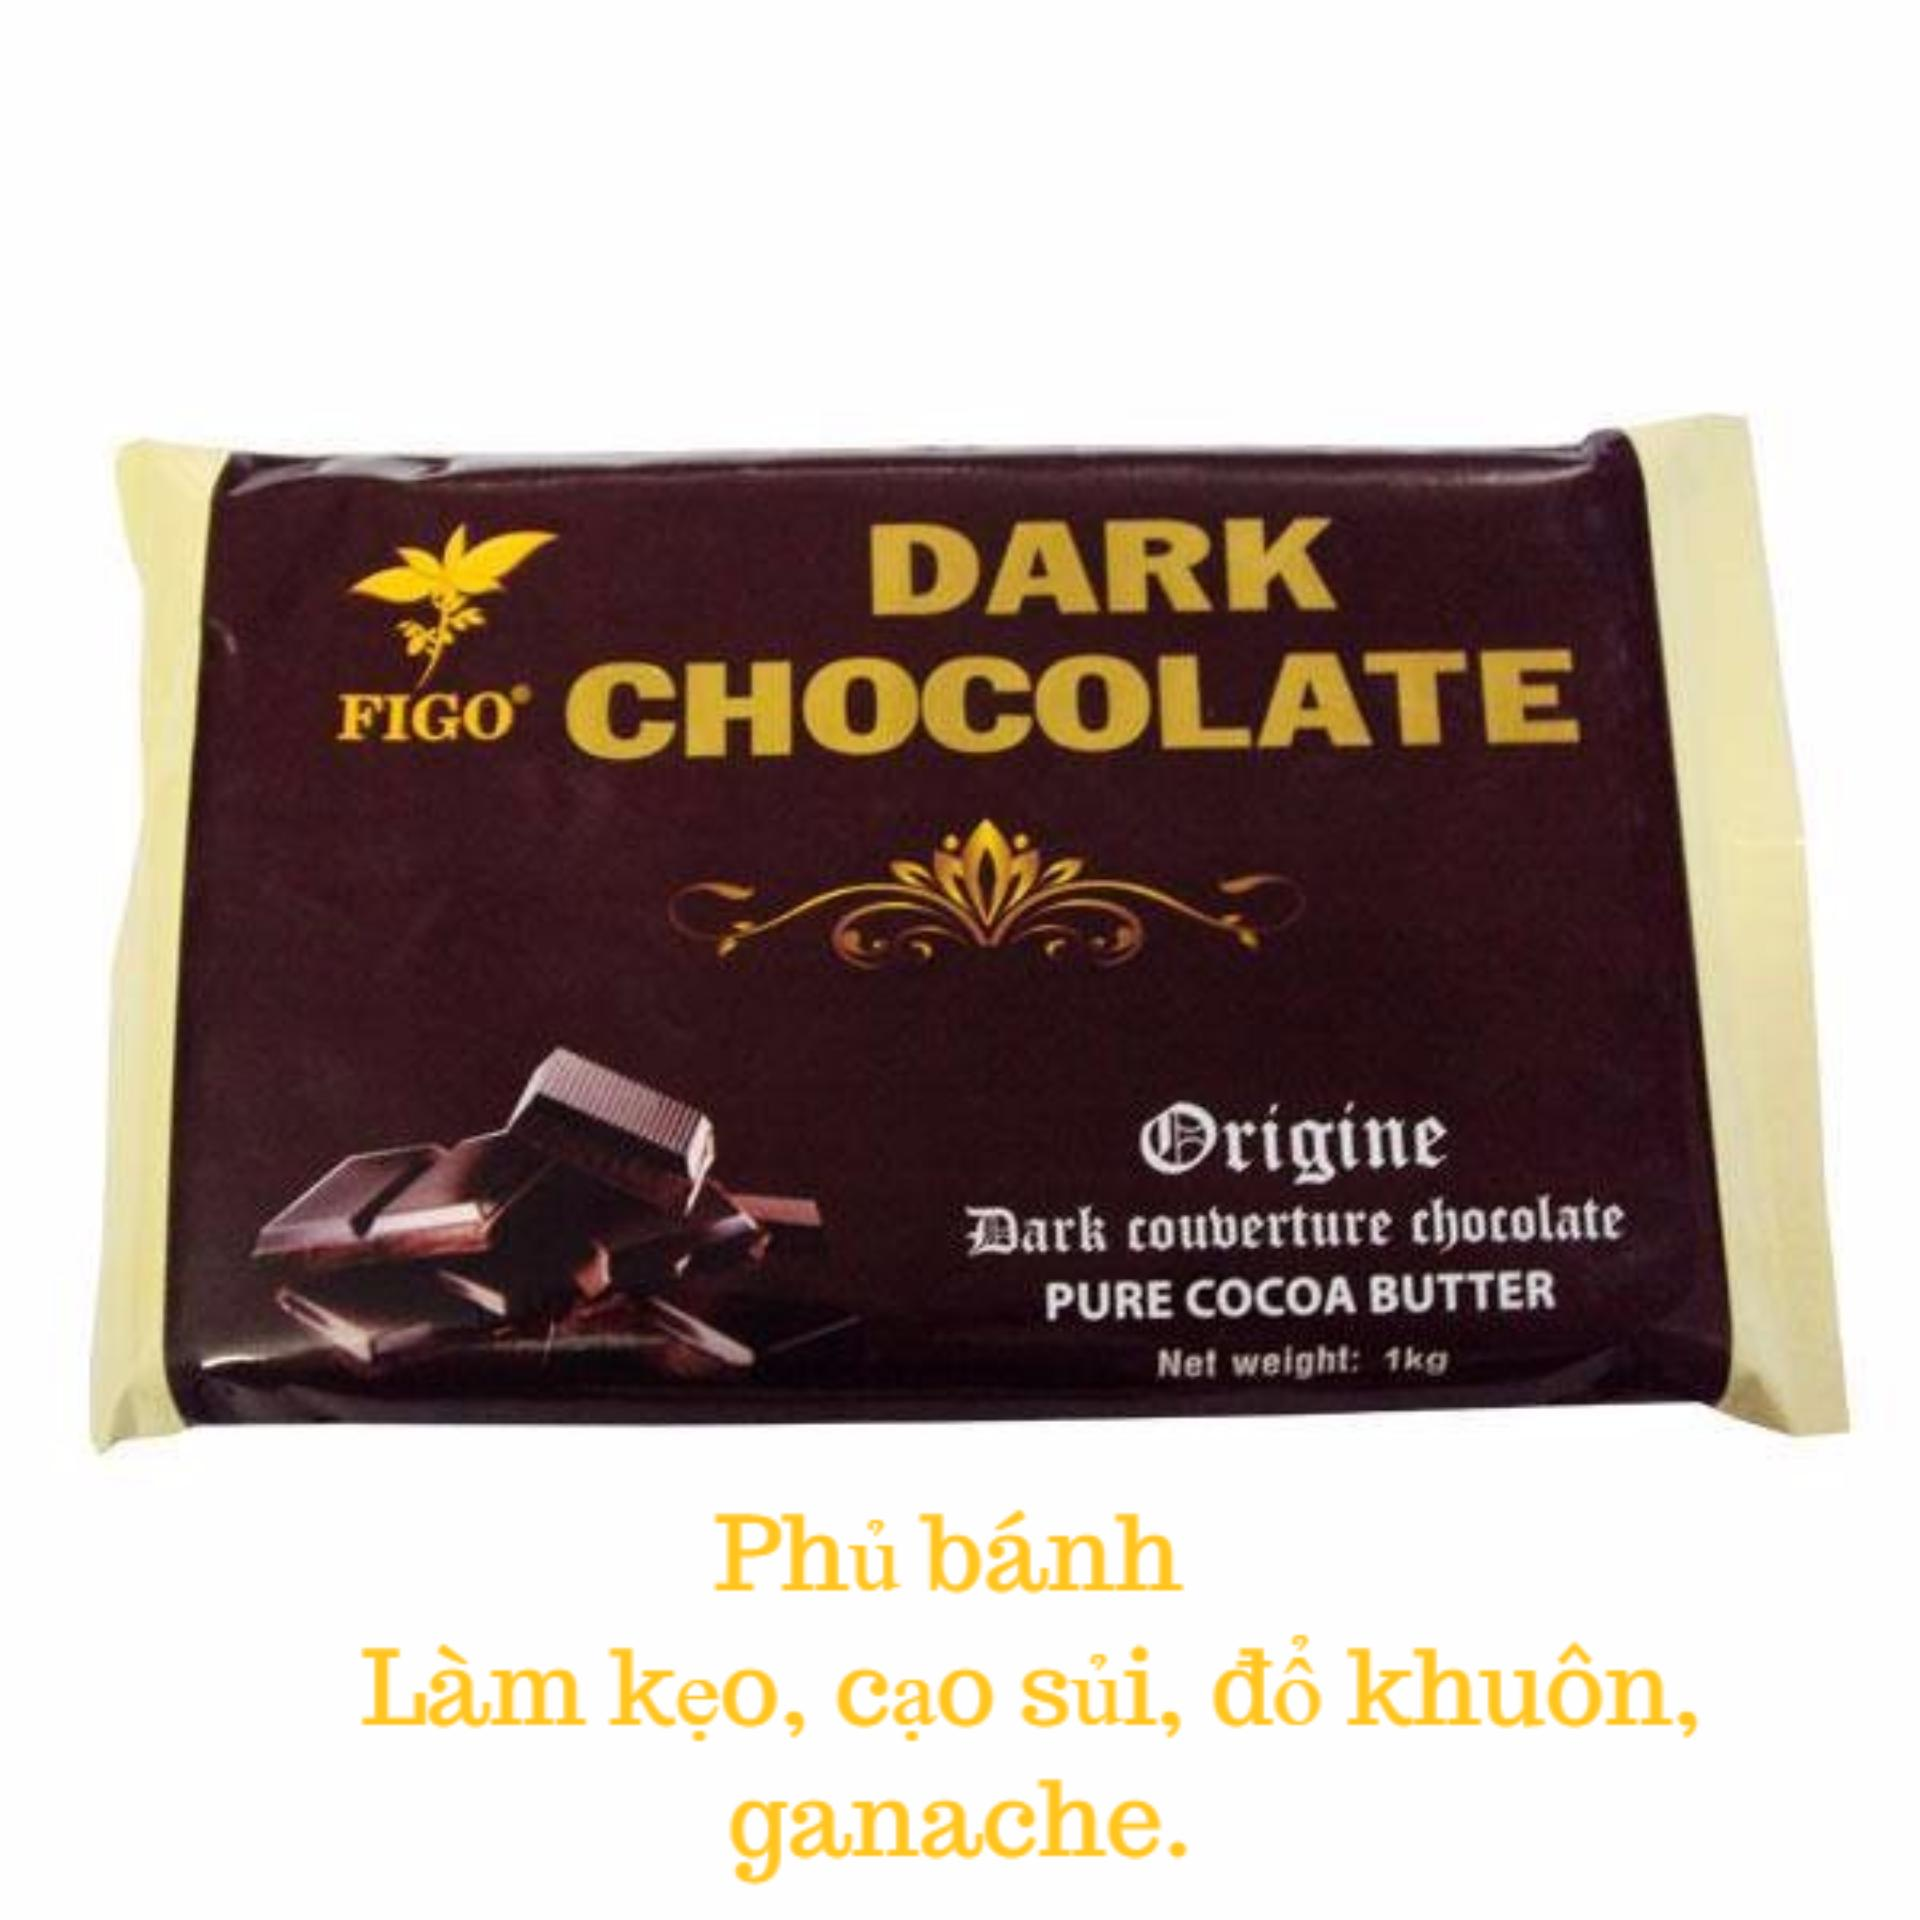 Chỗ bán Chocolate đen làm bánh 65% cacao Figo 500gram